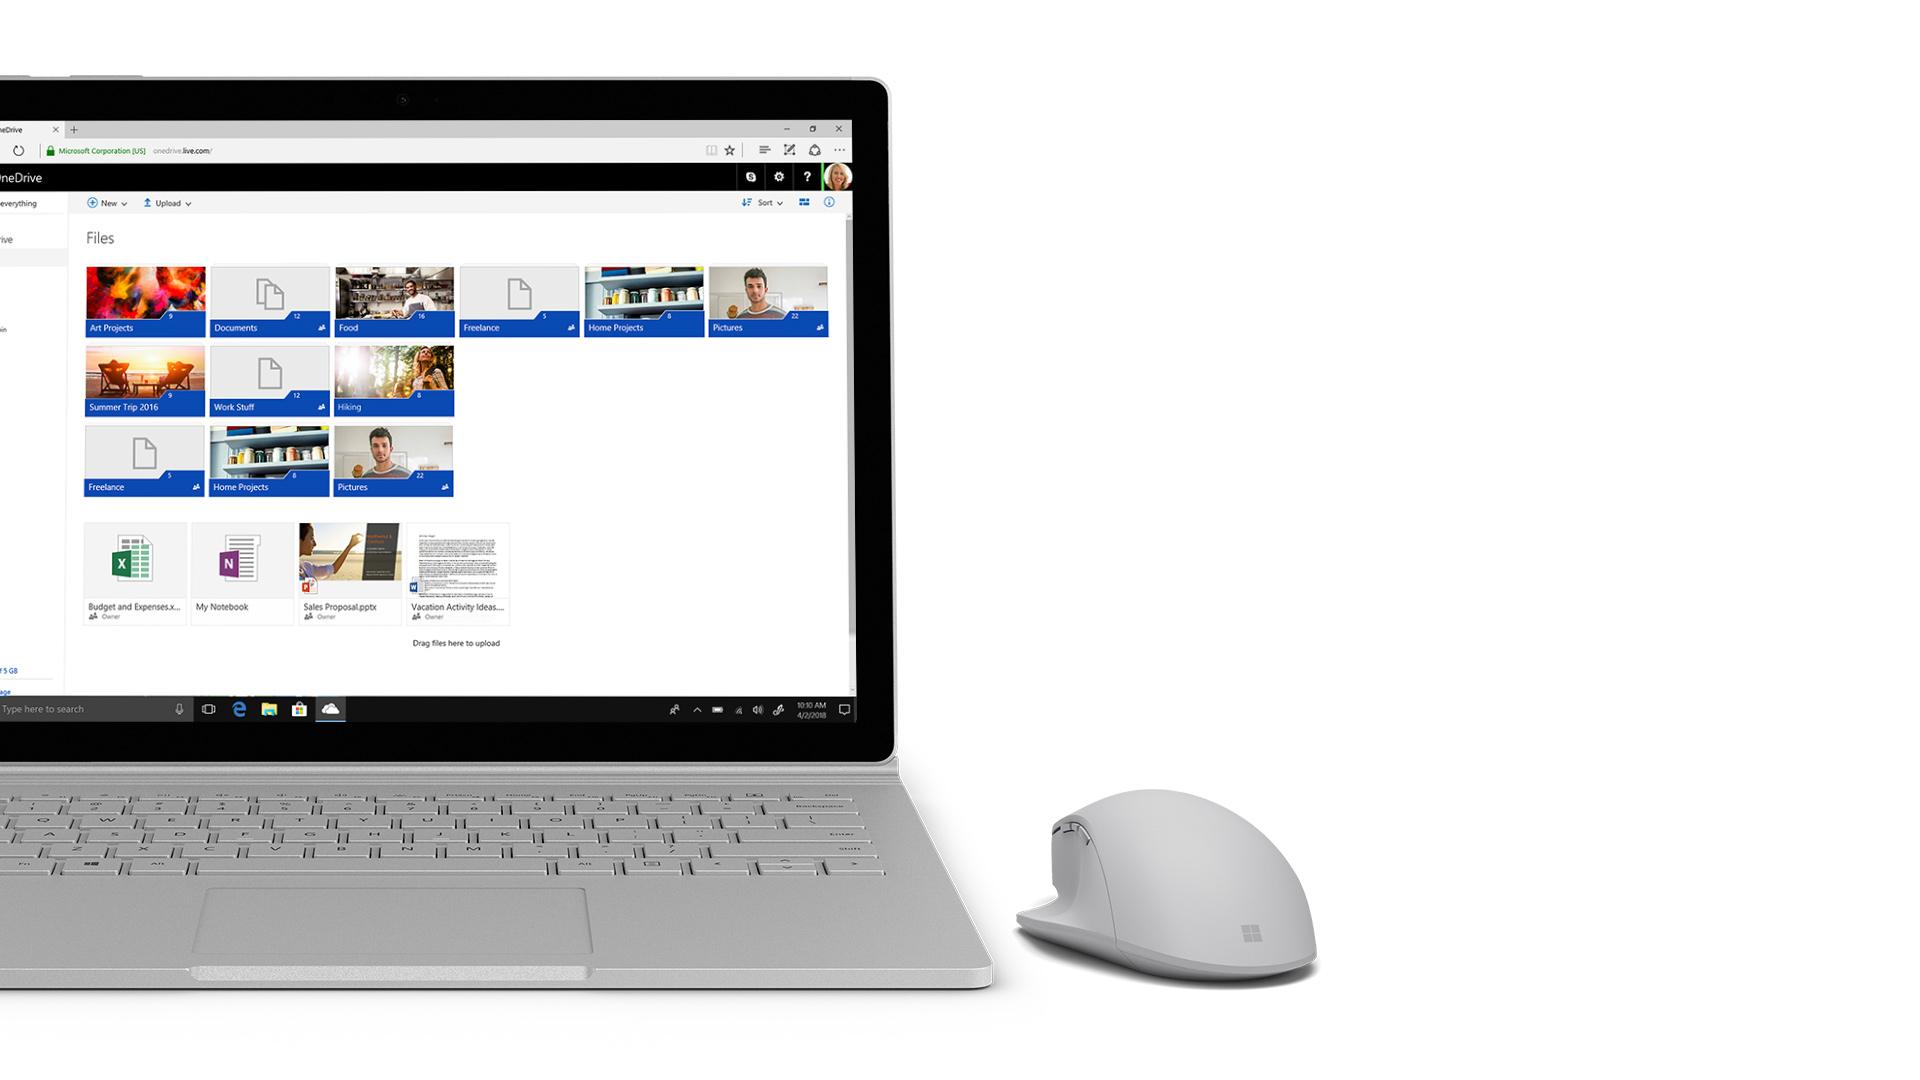 Surface 上の OneDrive スクリーンショット。